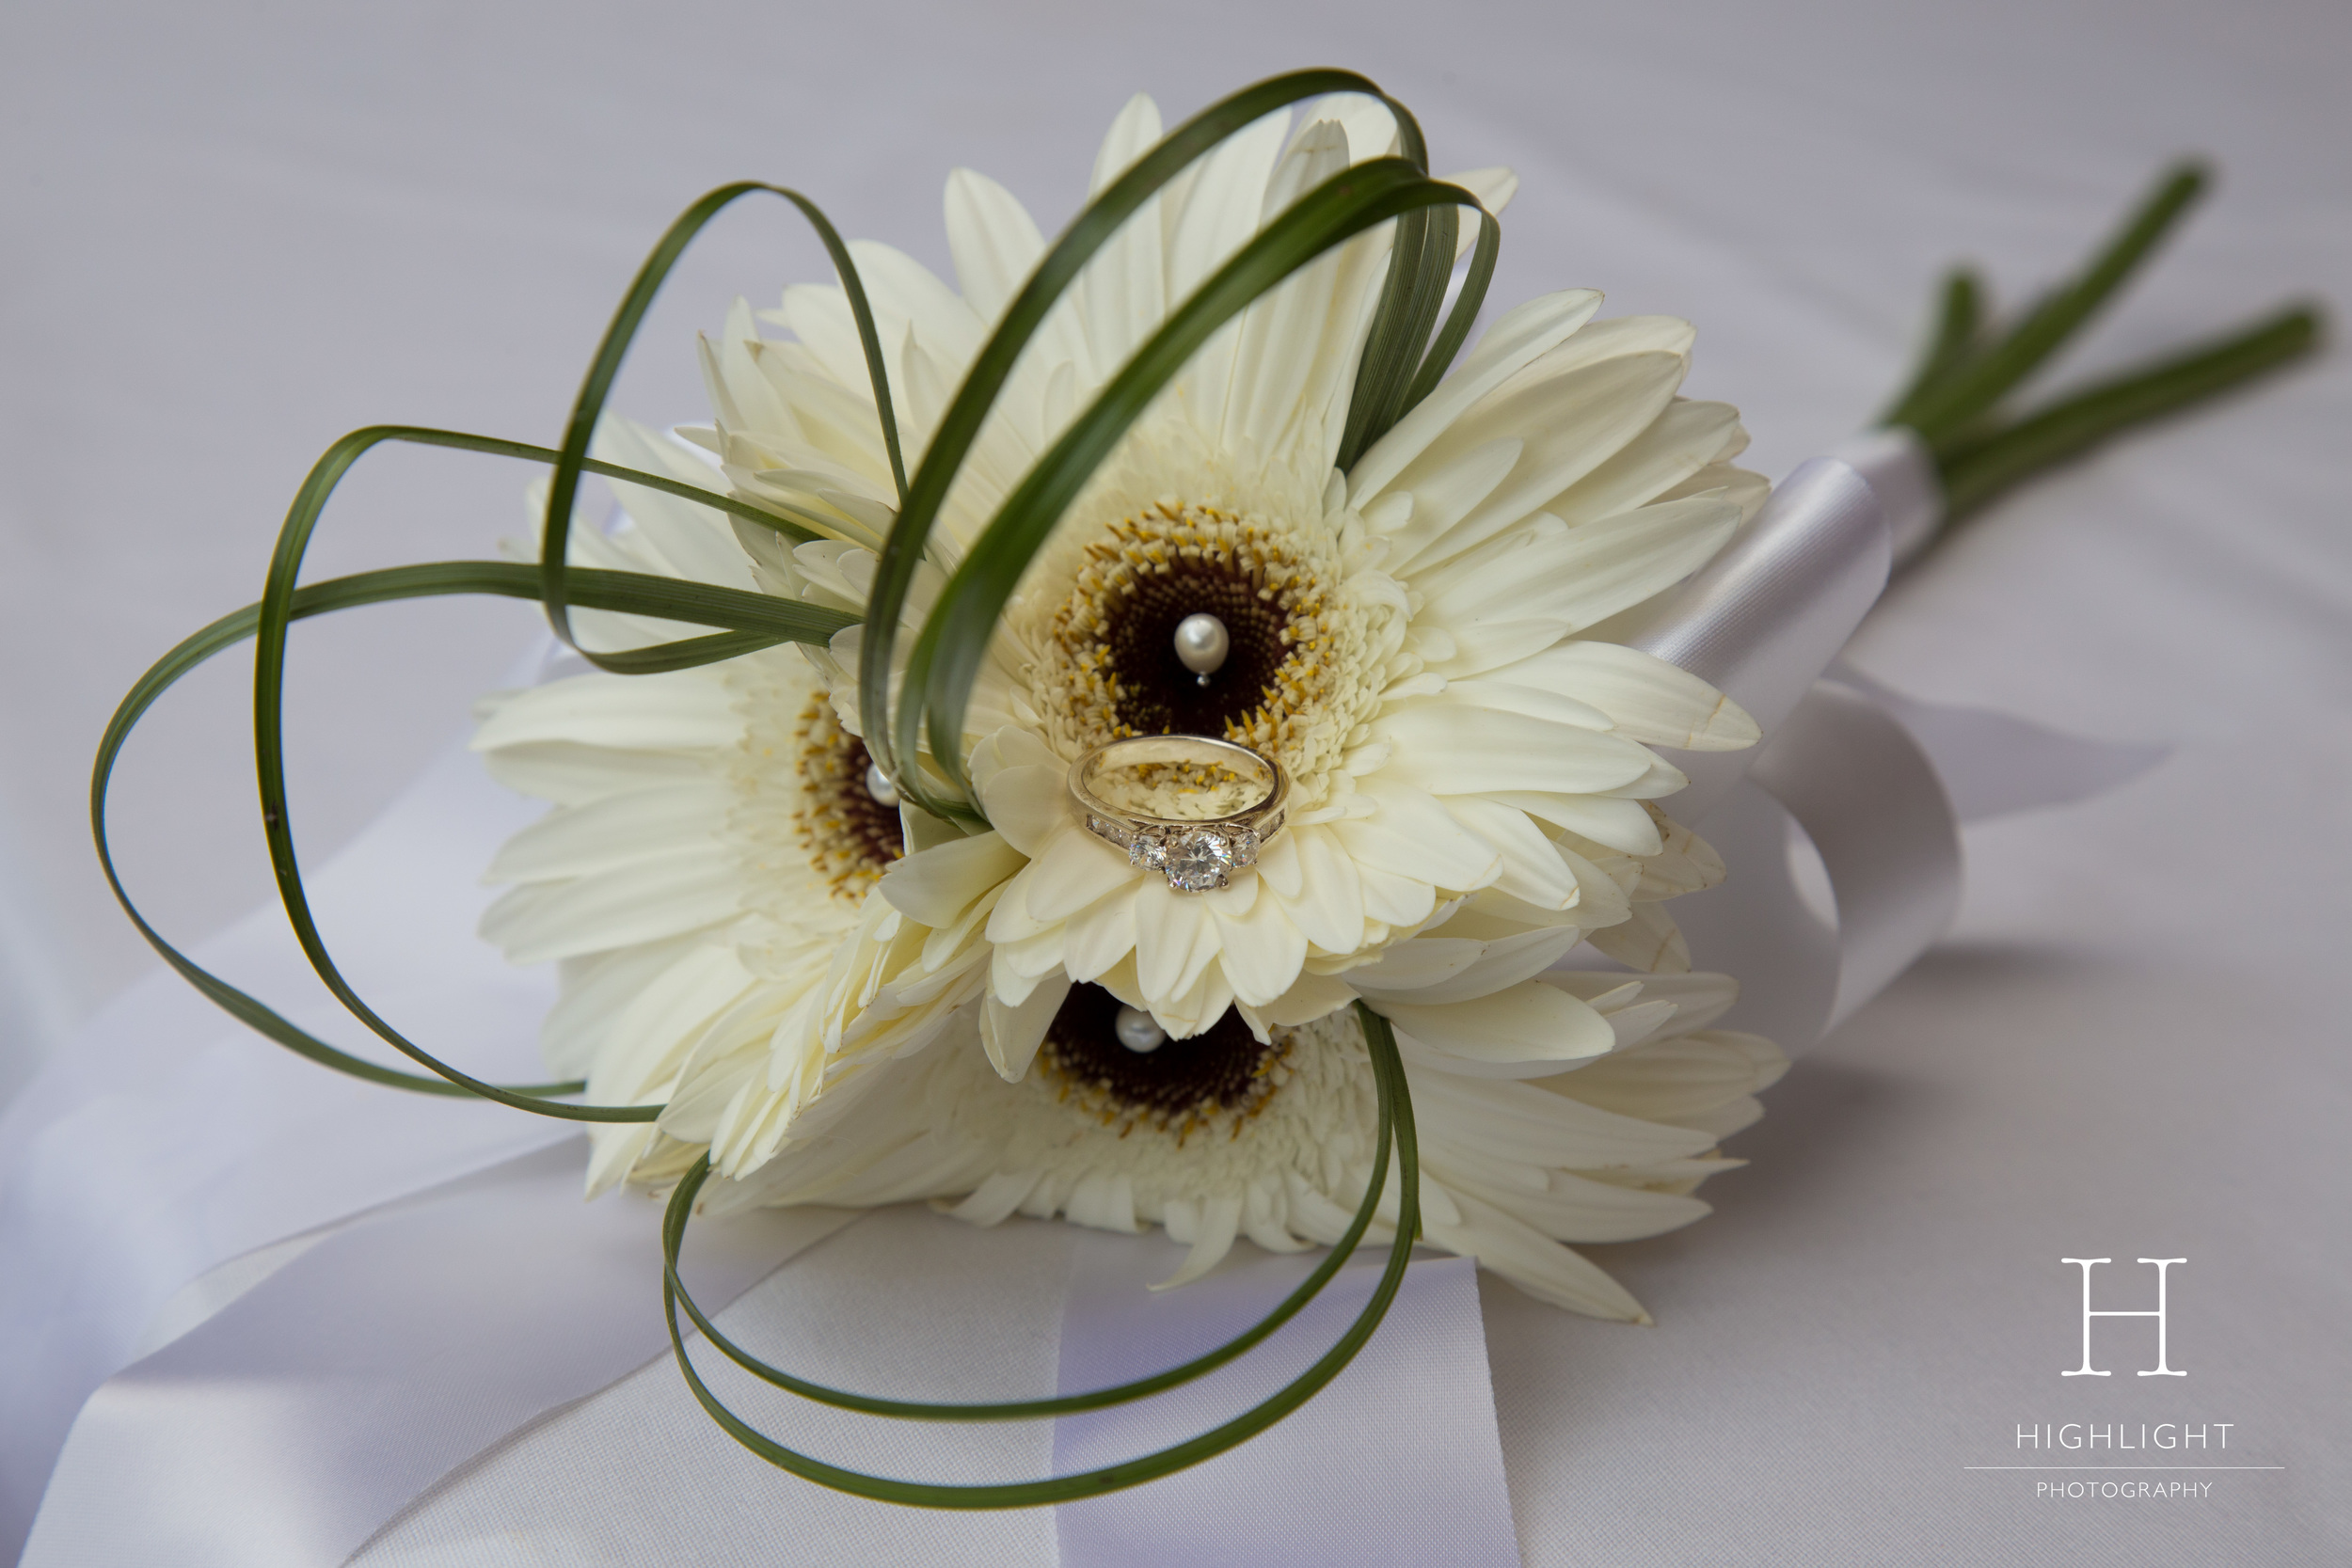 highlight_photography_wedding_new_zealand_flowers_wedding_ring_stewart_dawsons.jpg